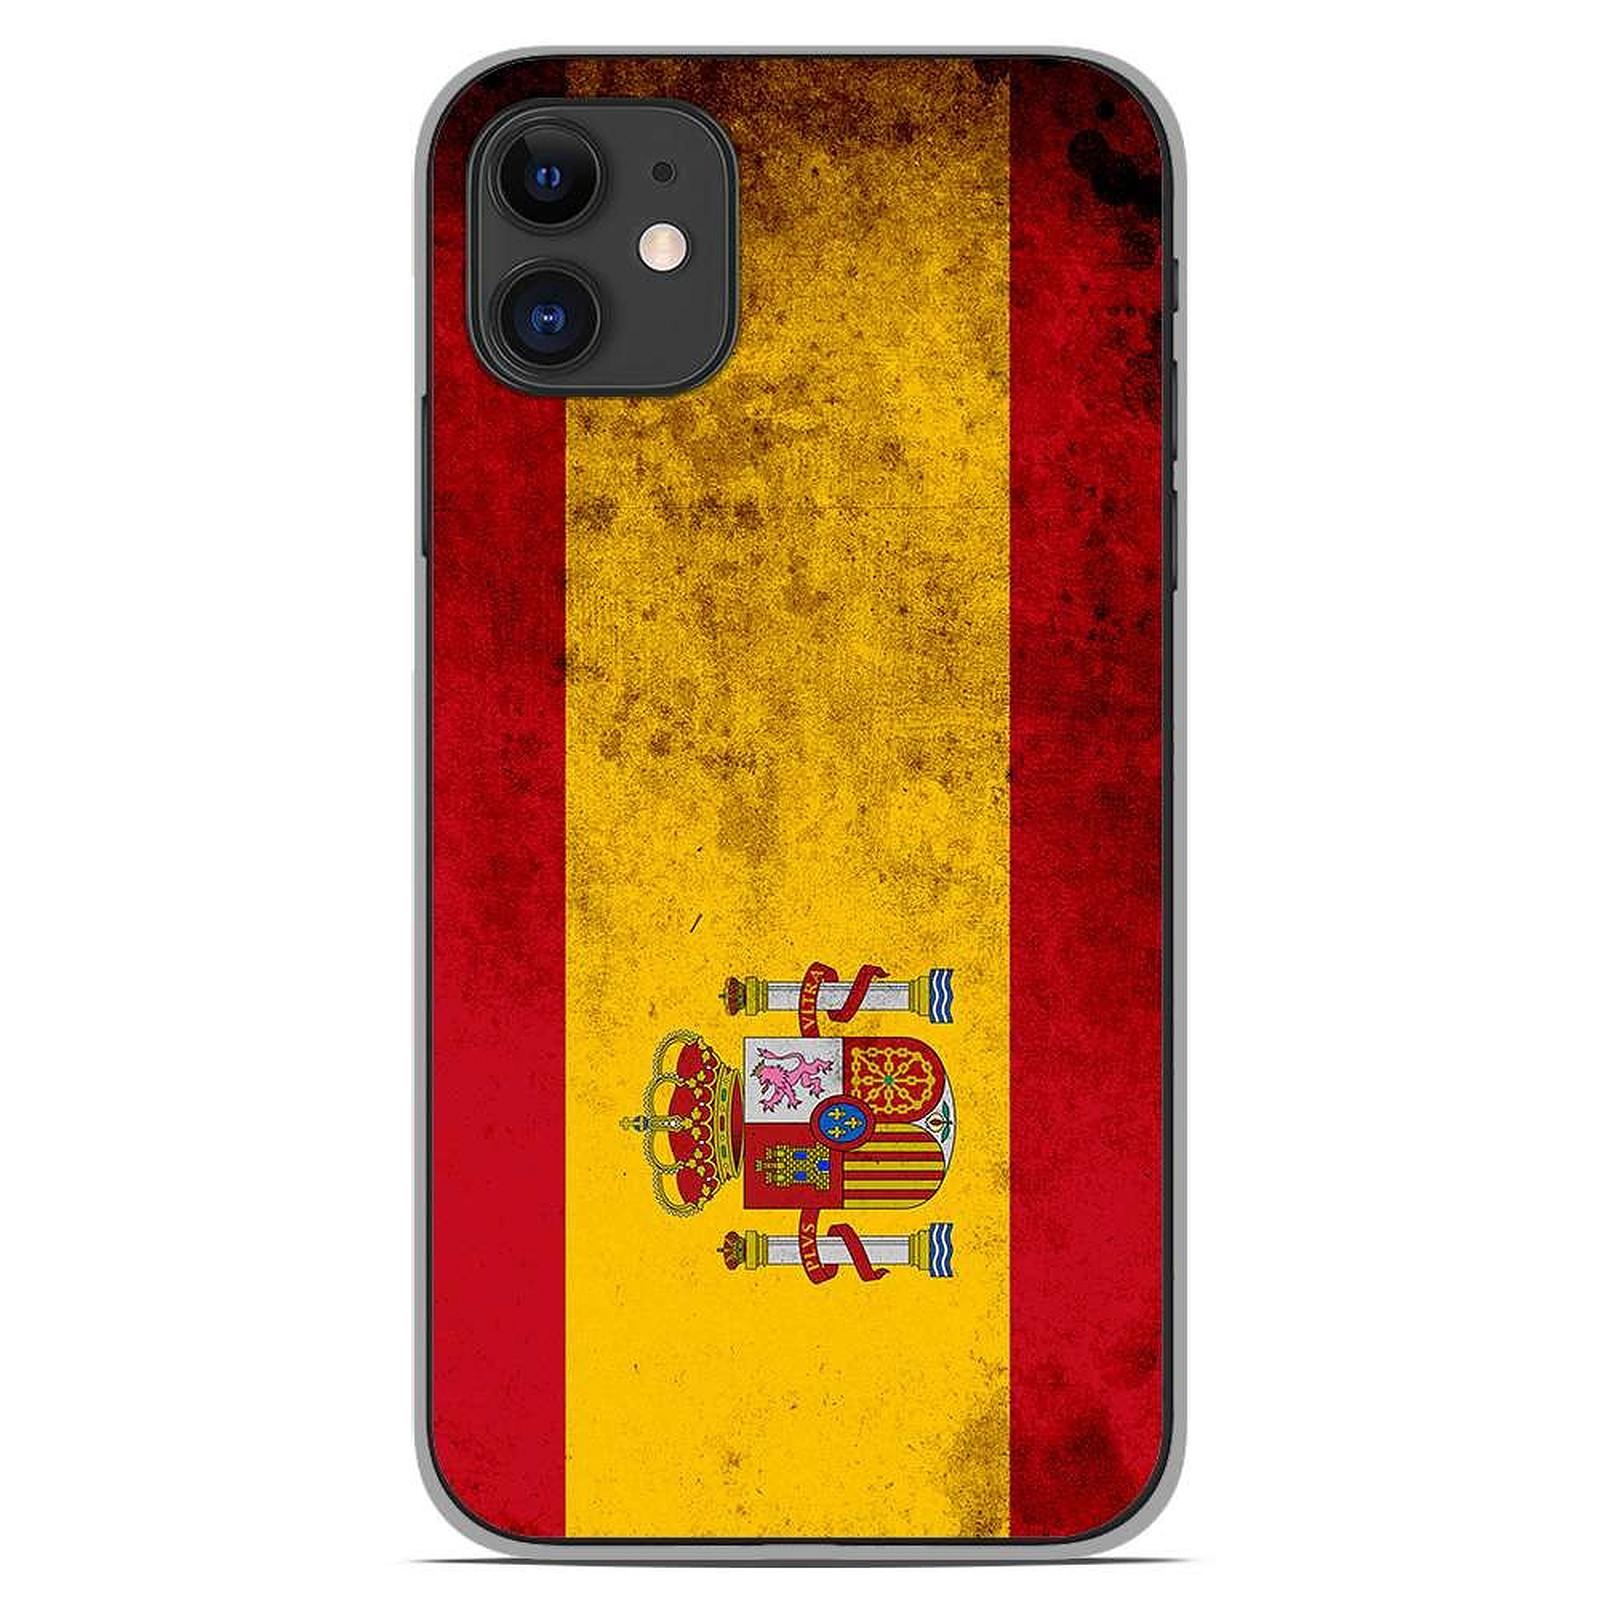 1001 Coques Coque silicone gel Apple iPhone 11 motif Drapeau Espagne